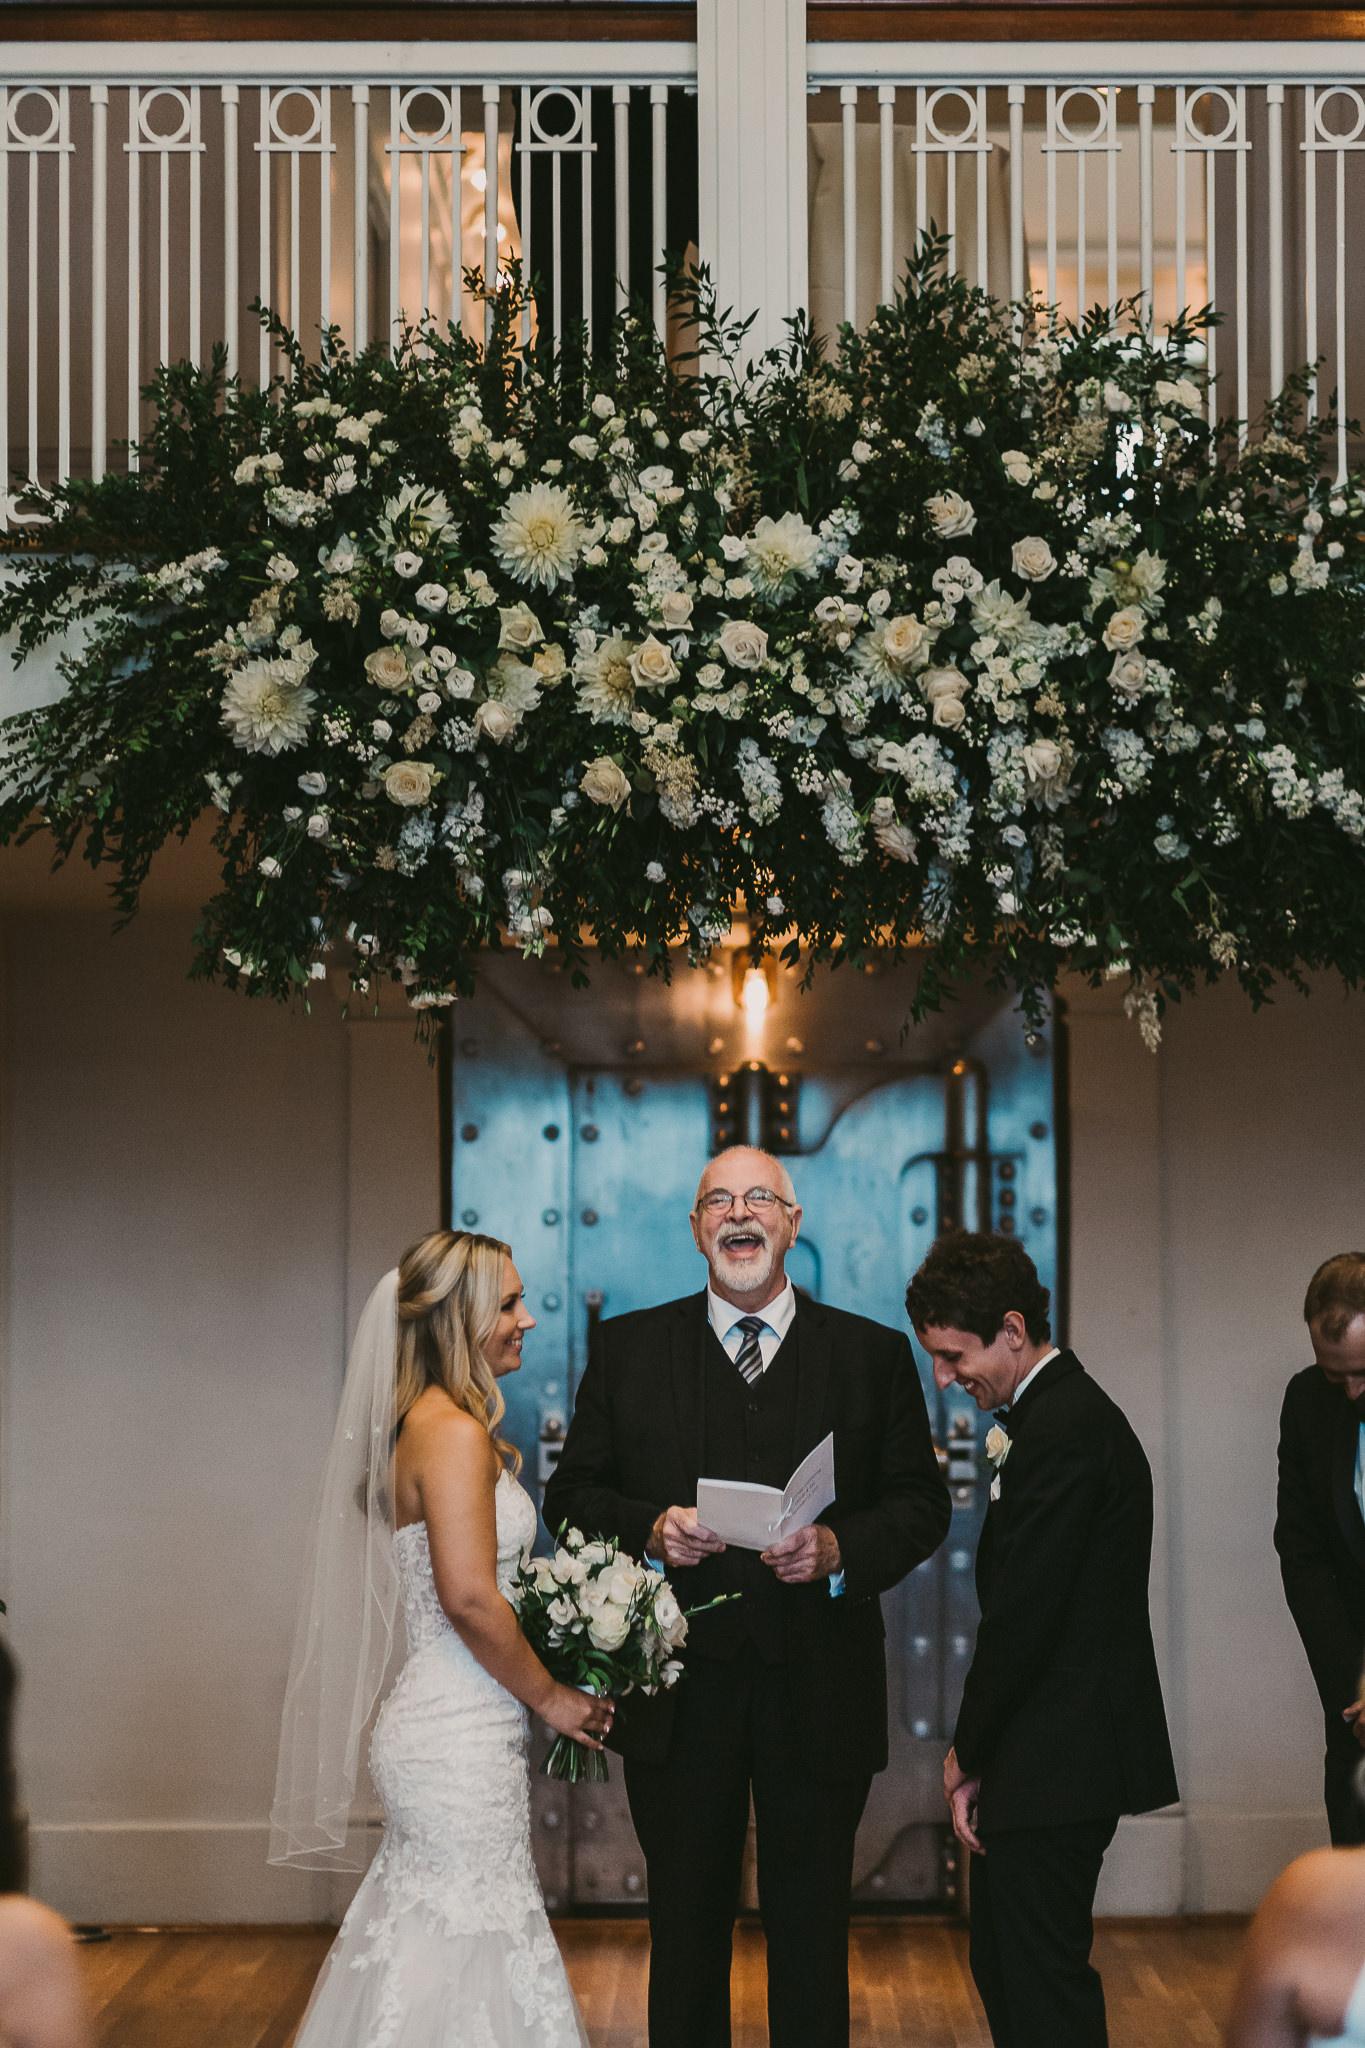 Vancouver Wedding Photographer; Abbotsford Wedding Photographer; Chilliwack Wedding Photographer; Lower Mainland Wedding Photographer; Langley Wedding Photographer; Lower Mainland Wedding Photographer